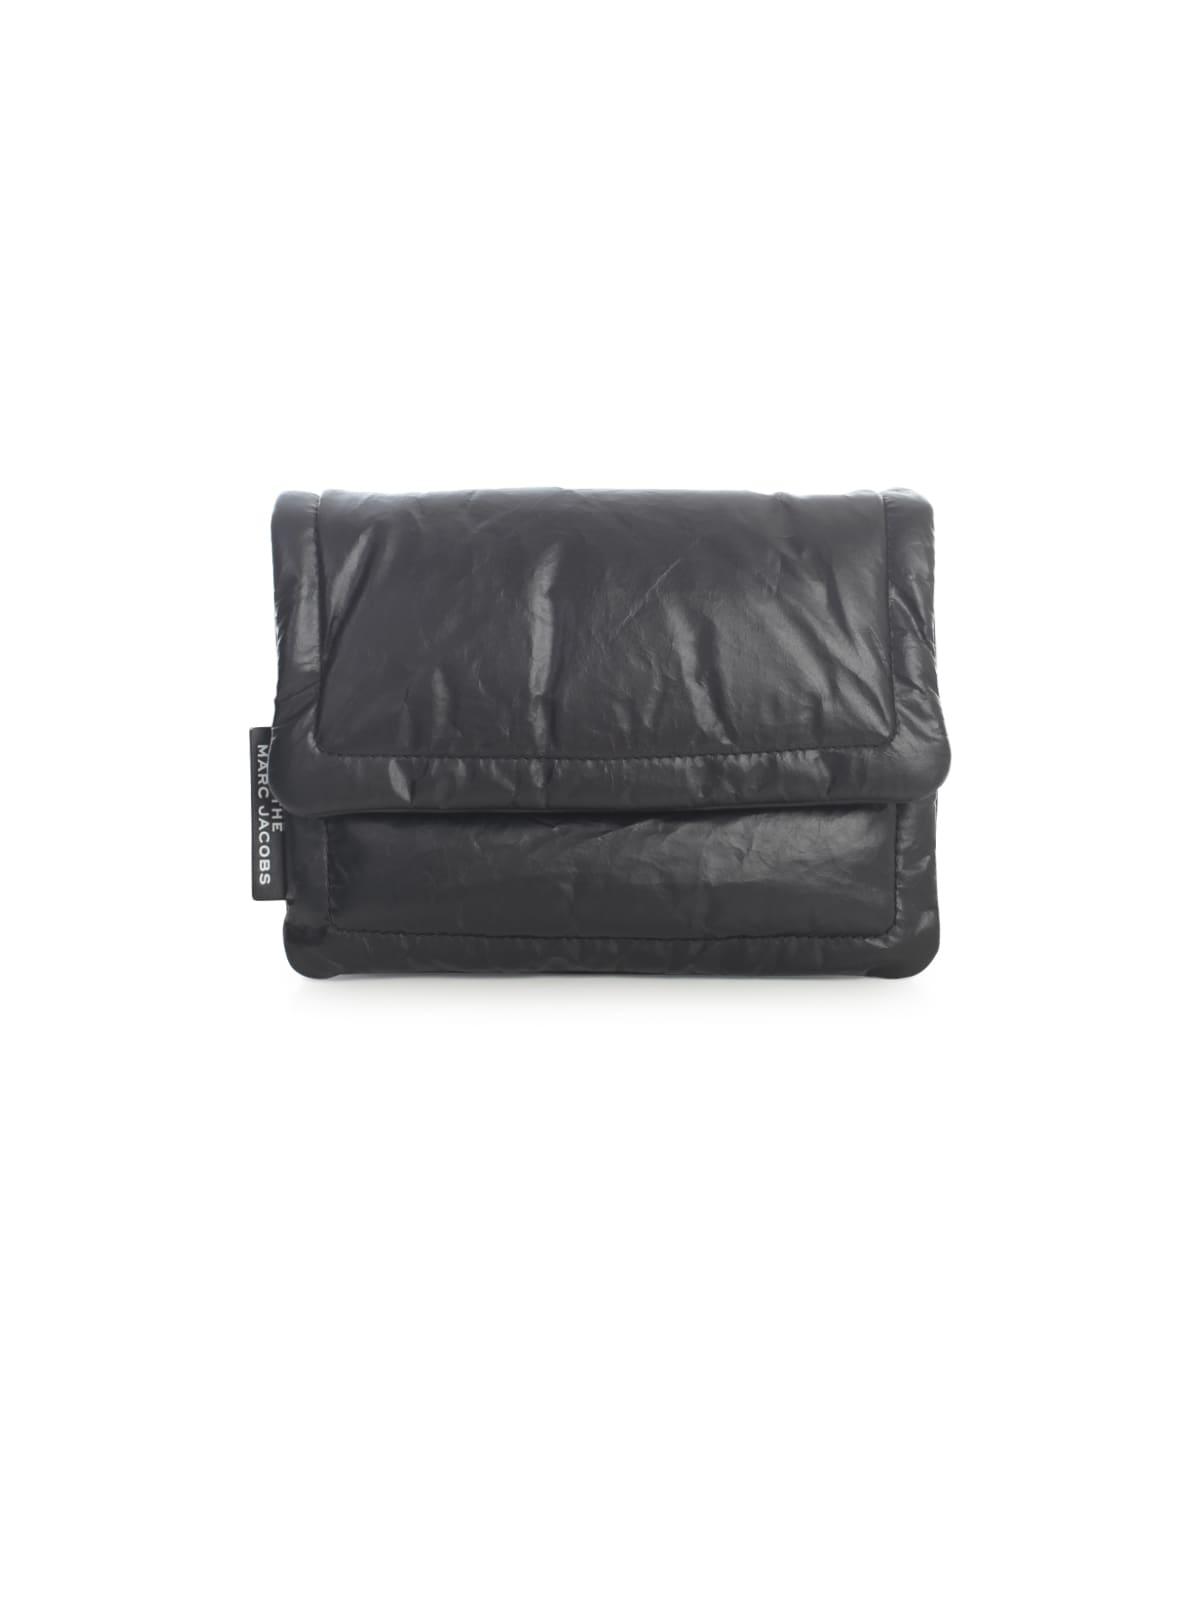 Marc Jacobs The Pillow Bag The Pillow Bag